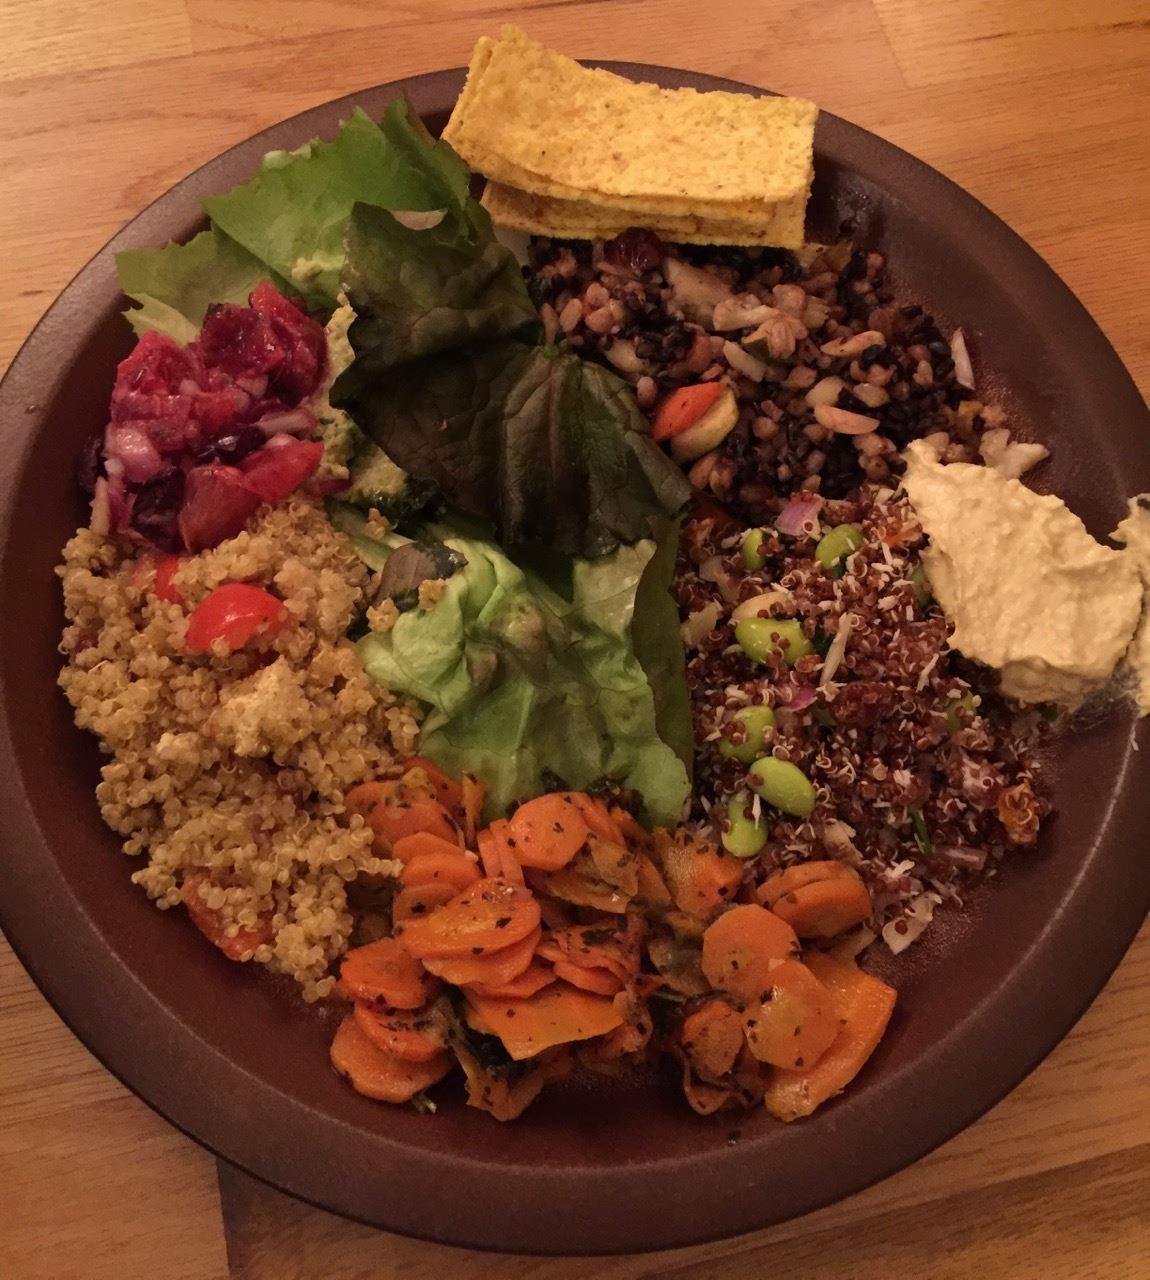 Amazing Vegan Meal